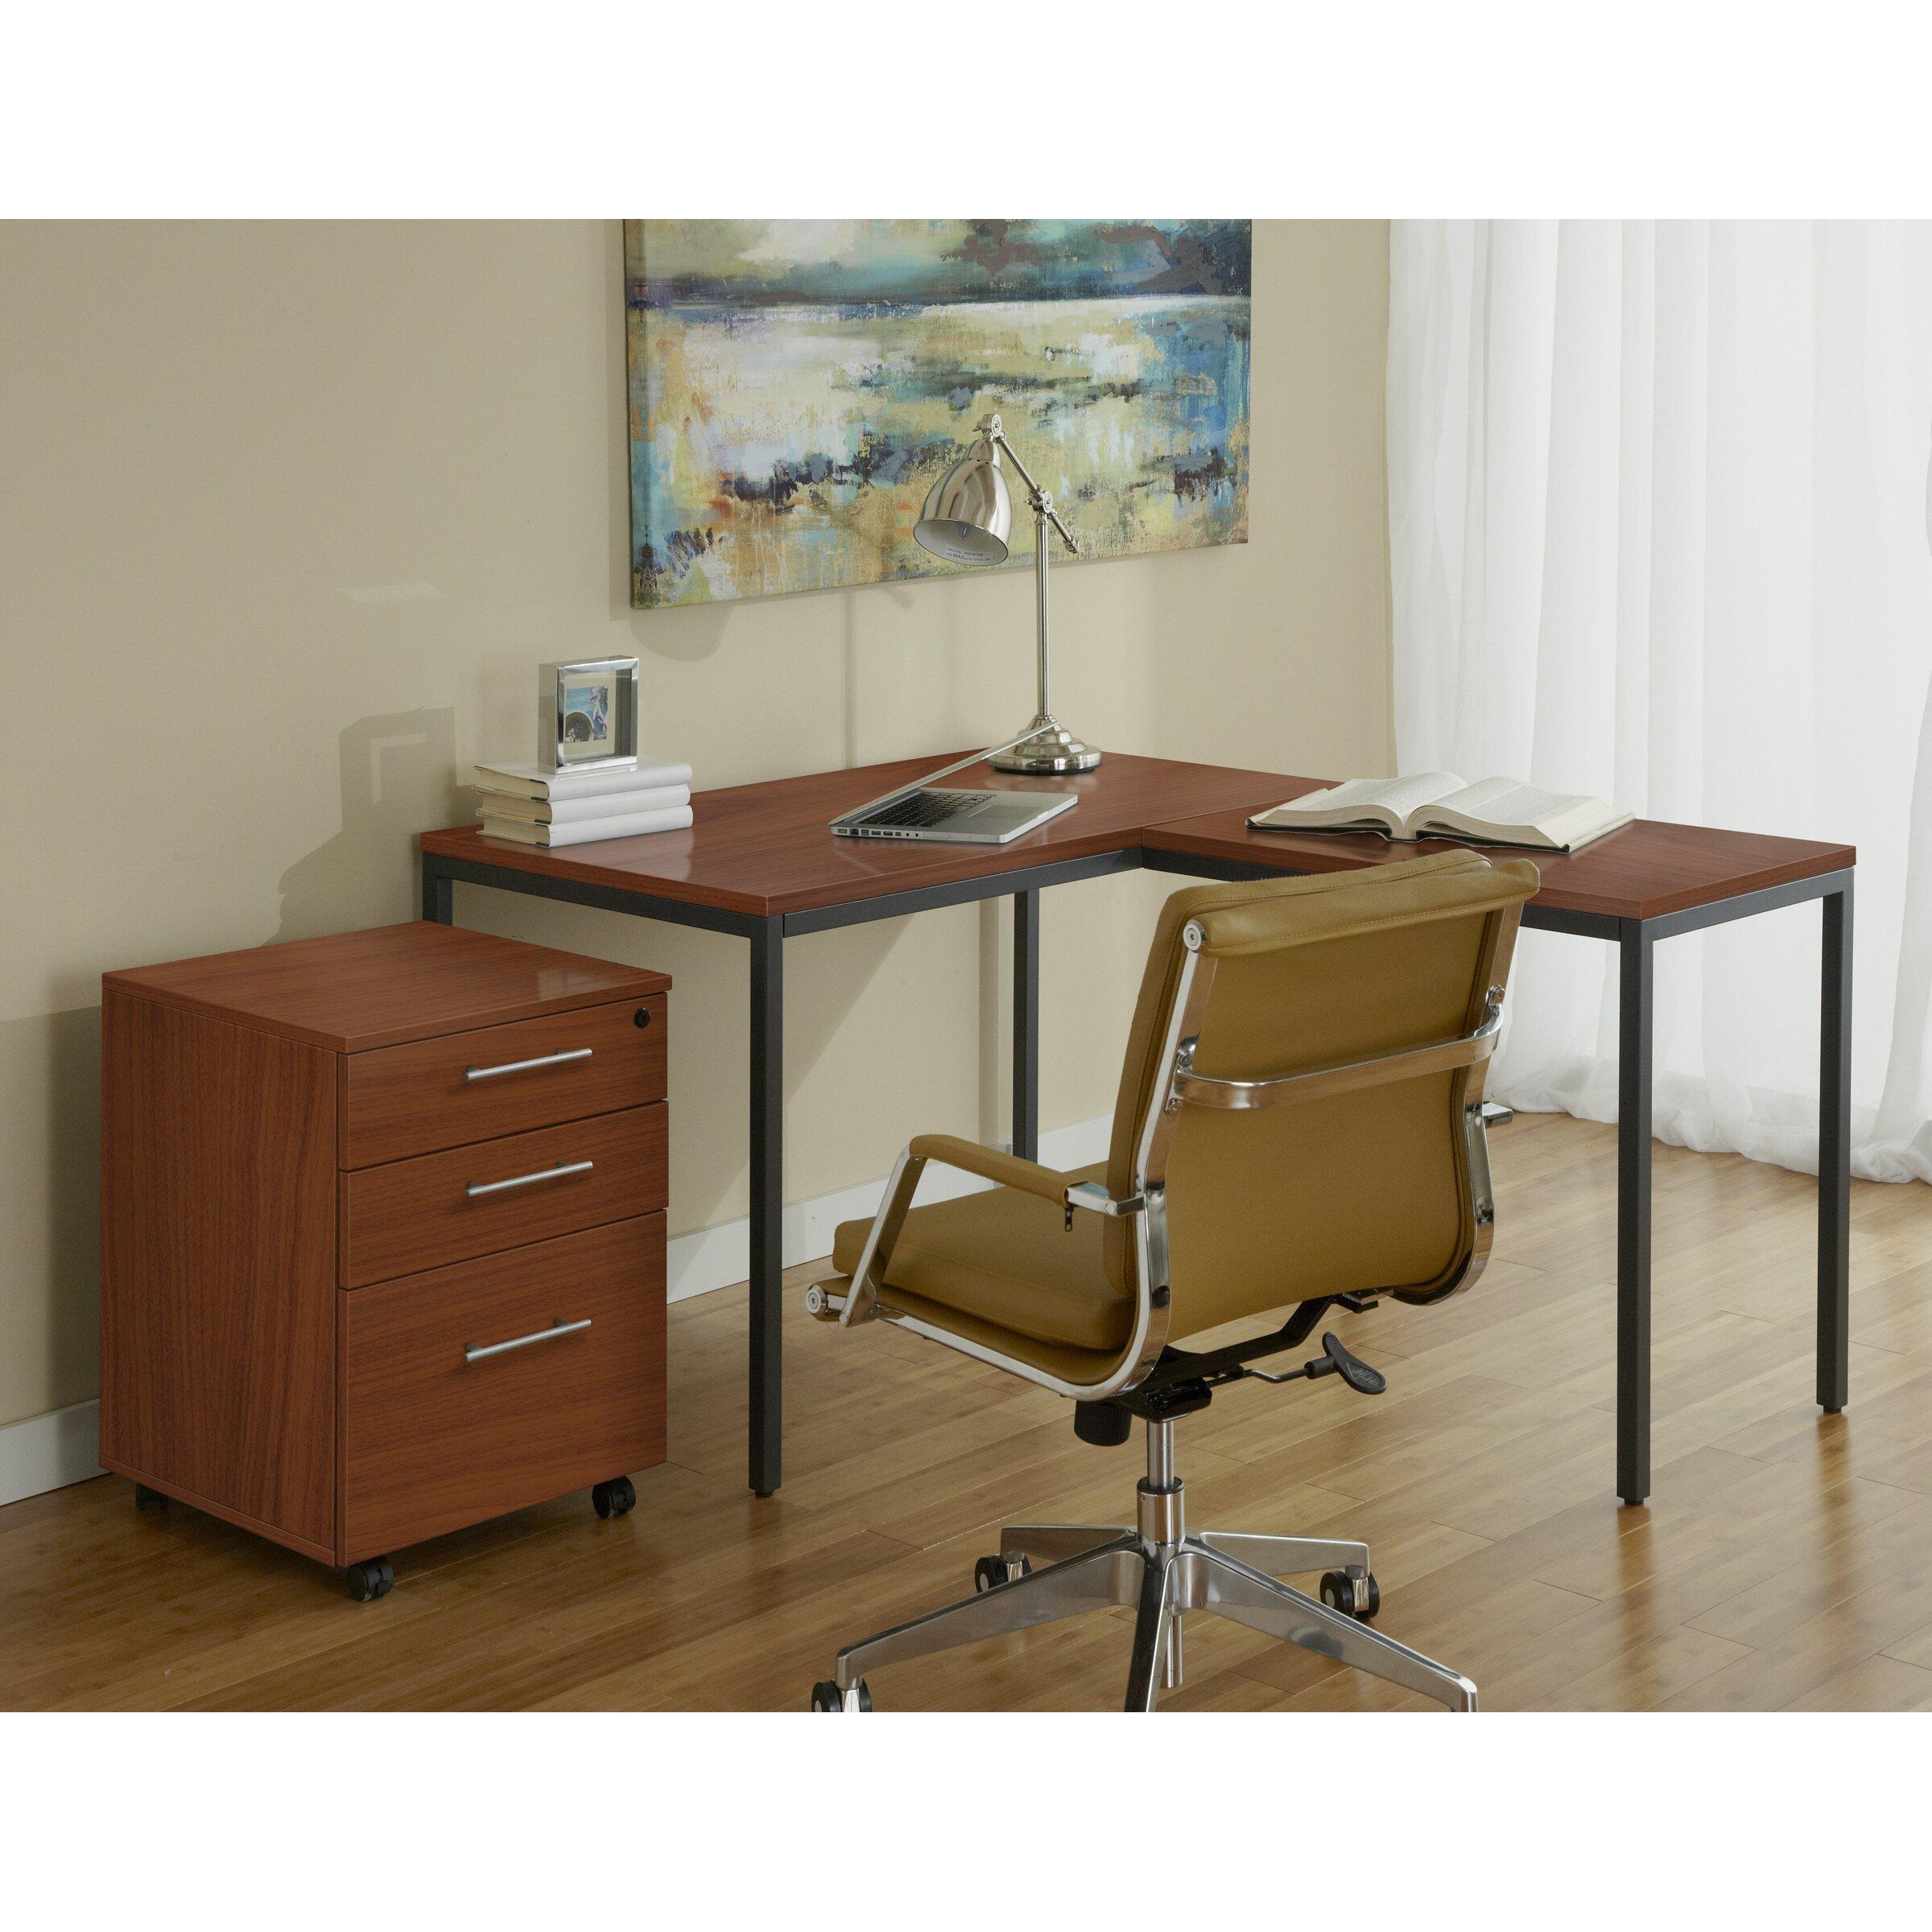 jesper office parson writing desk with file cabinet reviews wayfair. Black Bedroom Furniture Sets. Home Design Ideas